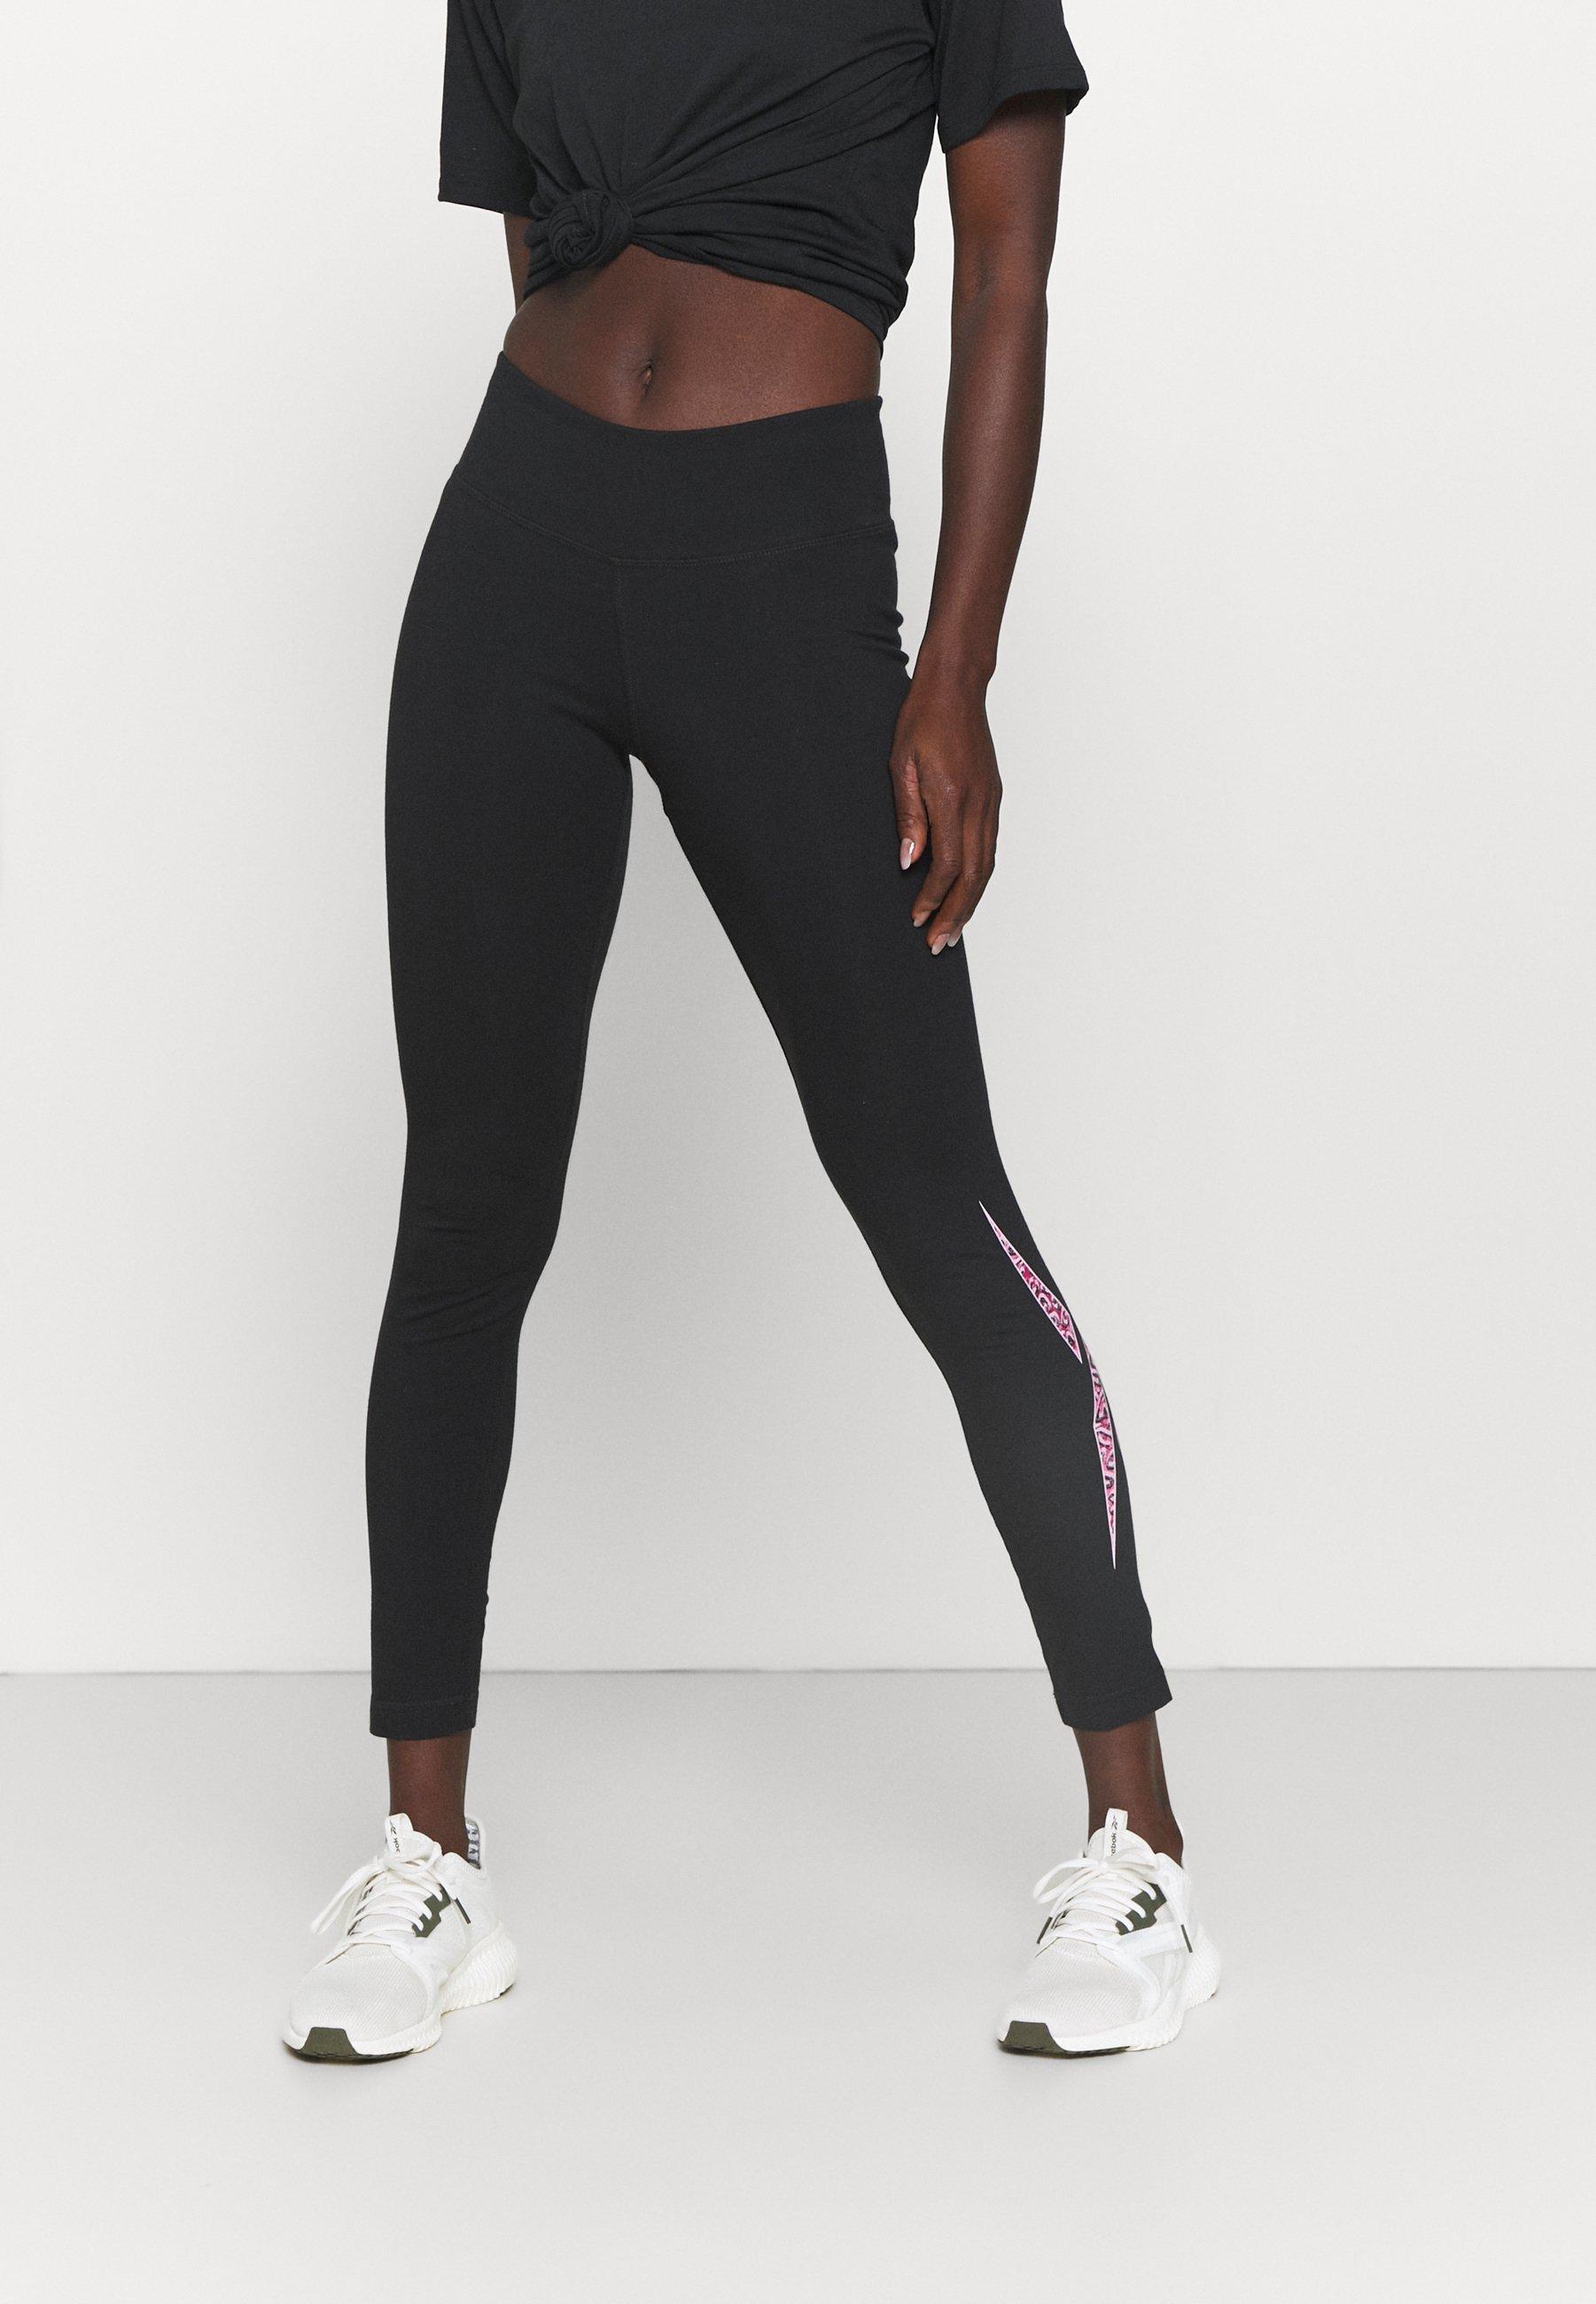 Femme MODERN SAFARI LEGGING - Collants